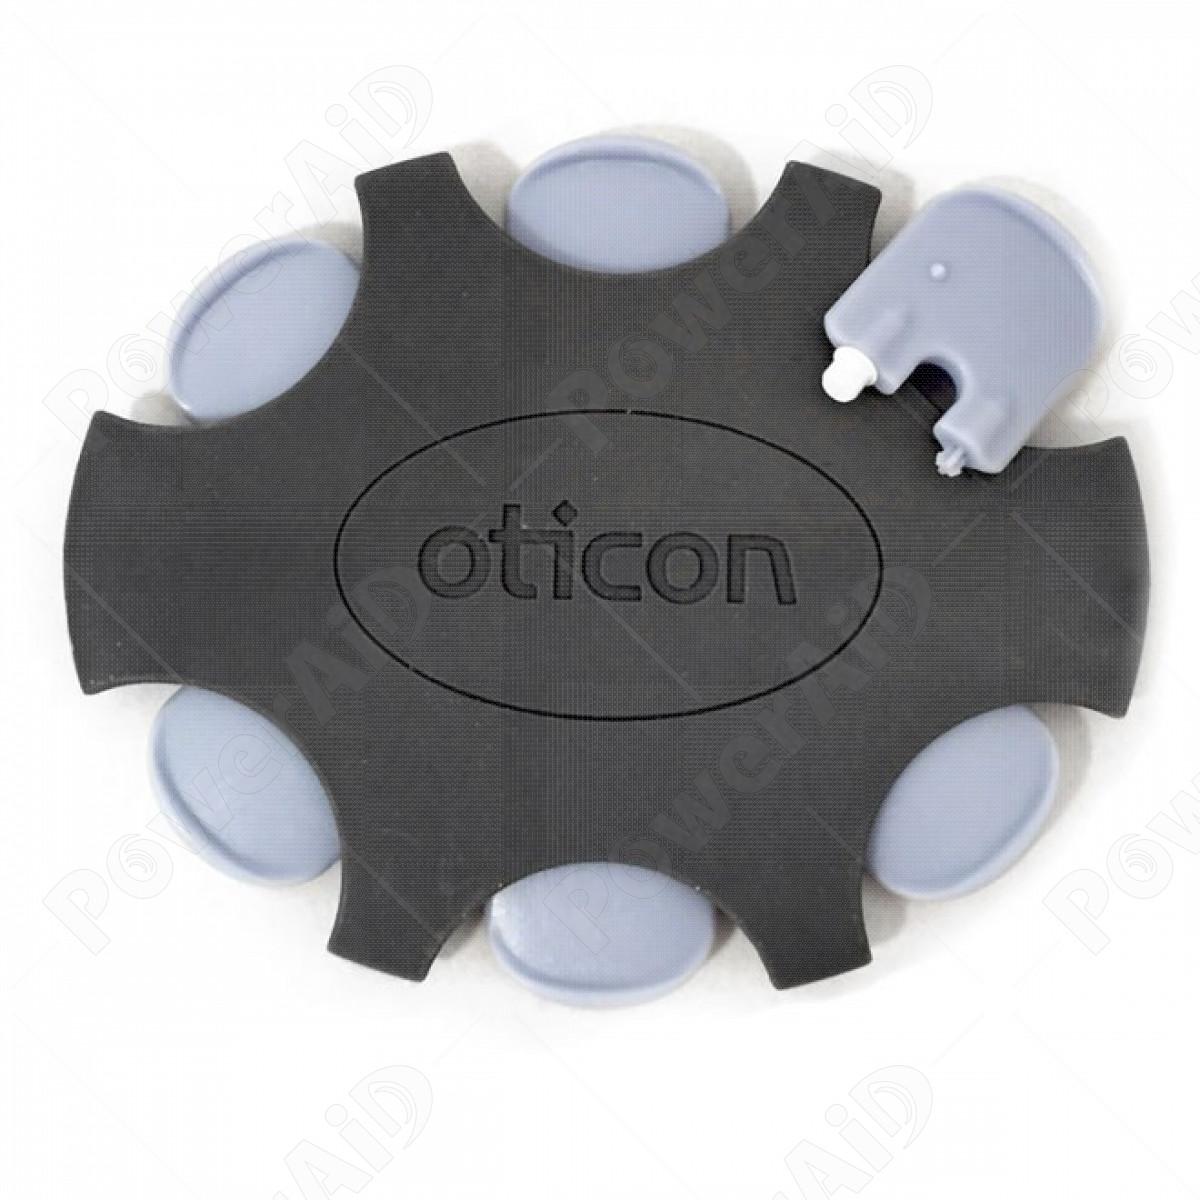 Oticon - Paracerume NoWax